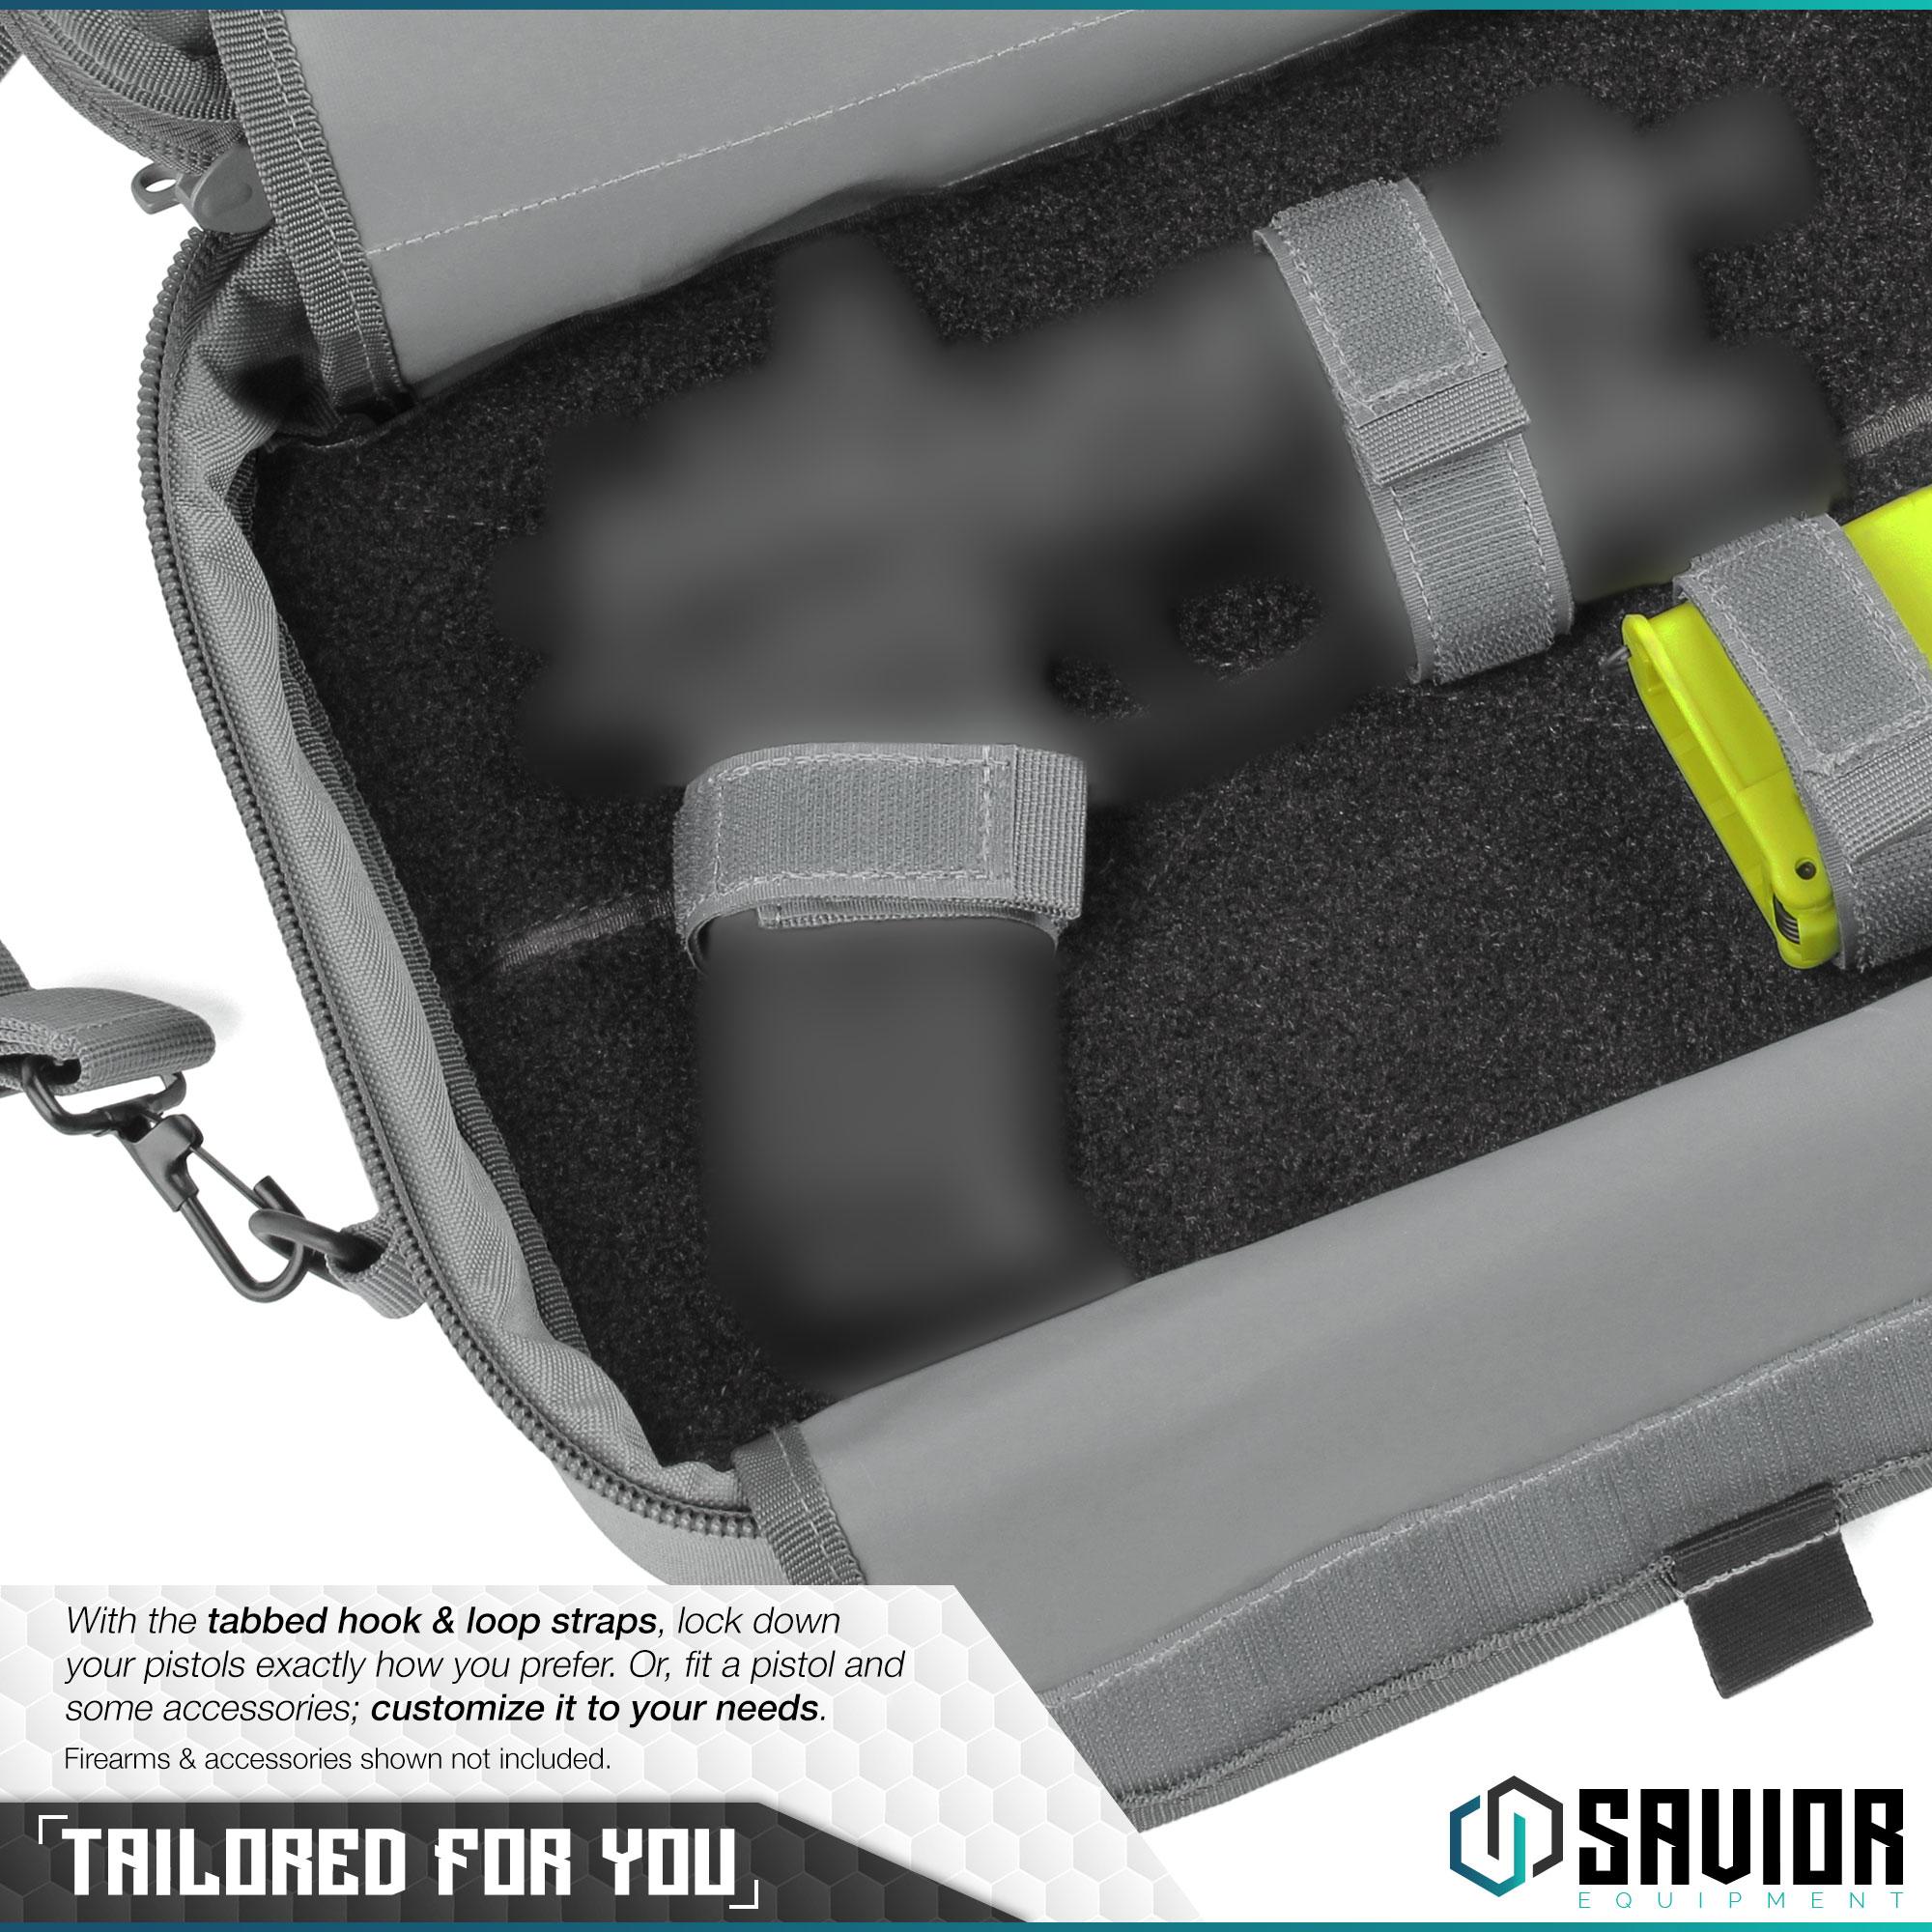 thumbnail 4 - 034-SAVIOR-034-Padded-Discreet-Double-Handgun-Bag-Pistol-Storage-Case-w-Mag-Pouch-Slot